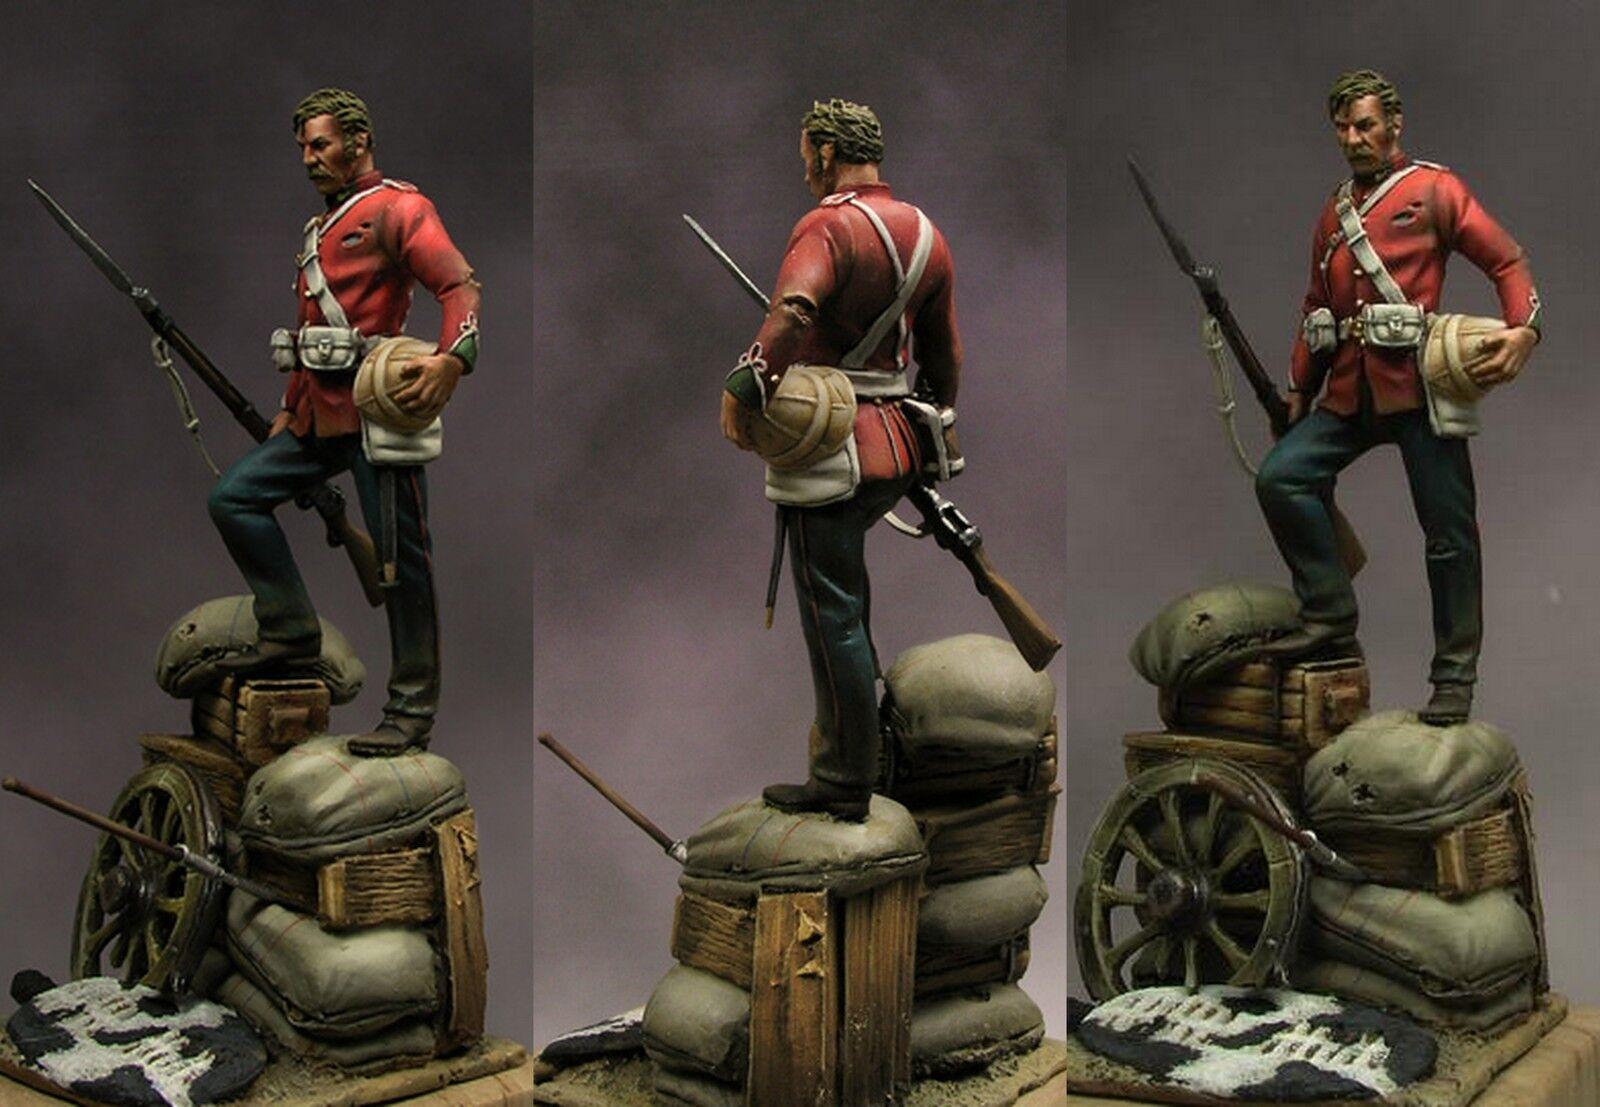 Beneito Private 24th Foot Rorke's Drift Zulu War 1879 (2) 54mm Unpainted kit